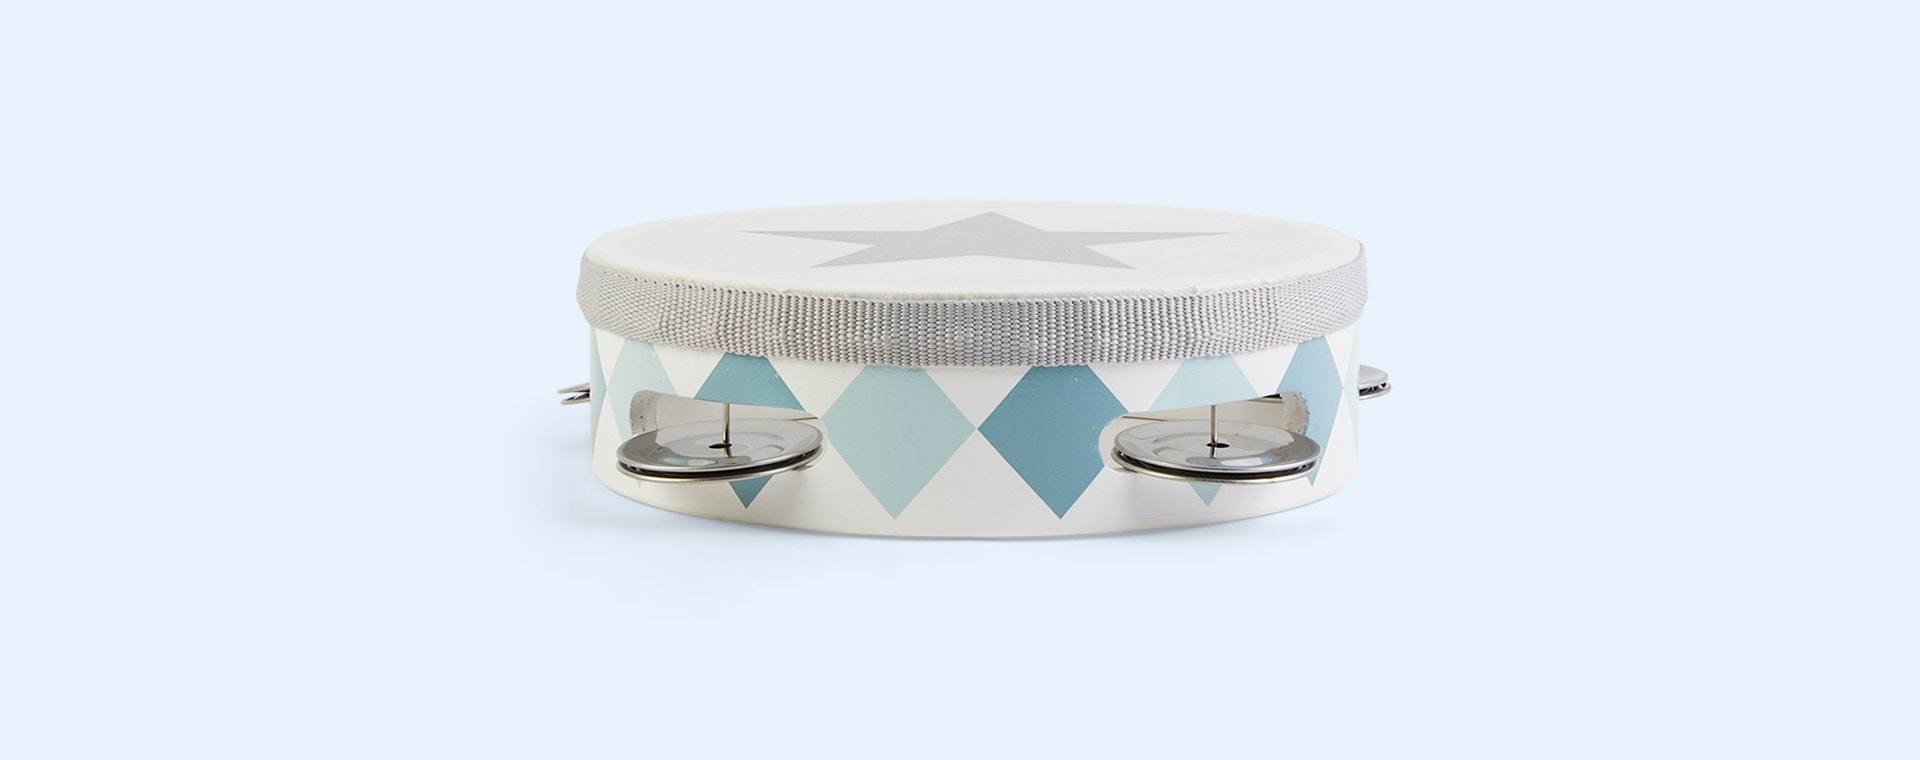 Blue Jabadabado Tambourine Drum